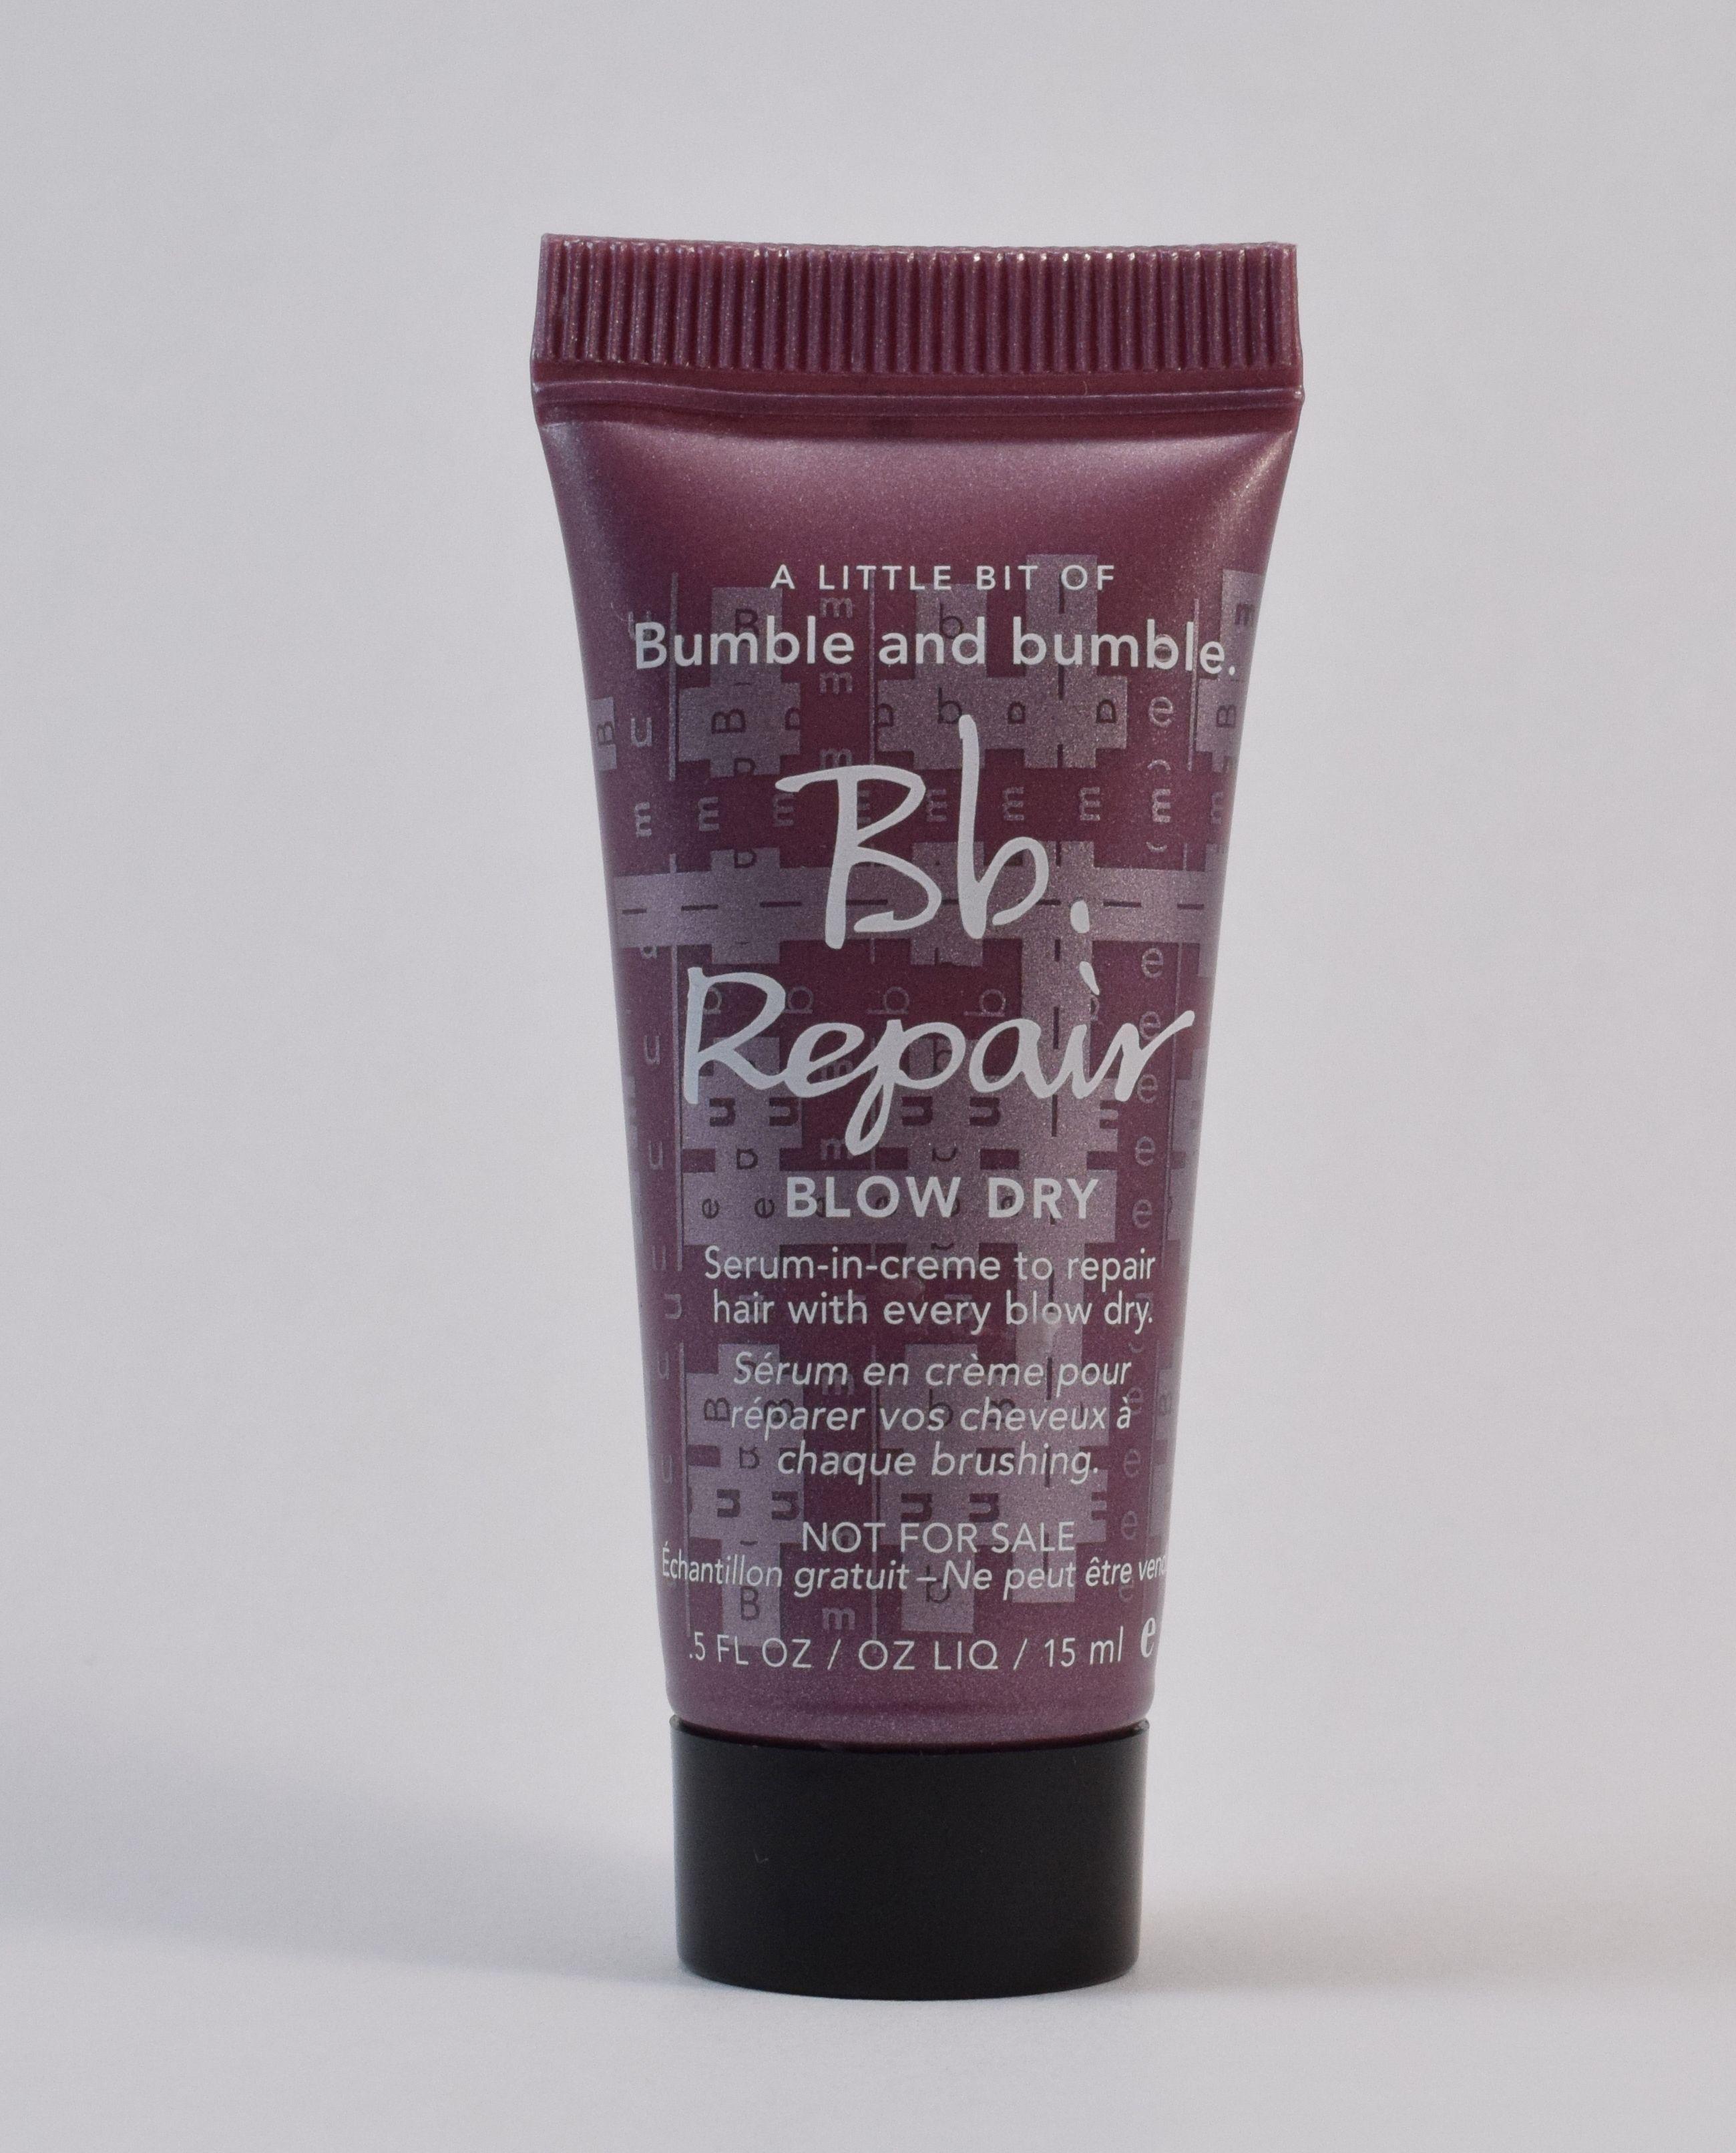 Bumble & Bumble Bb repair blow dry (0.5fl oz) BN $3